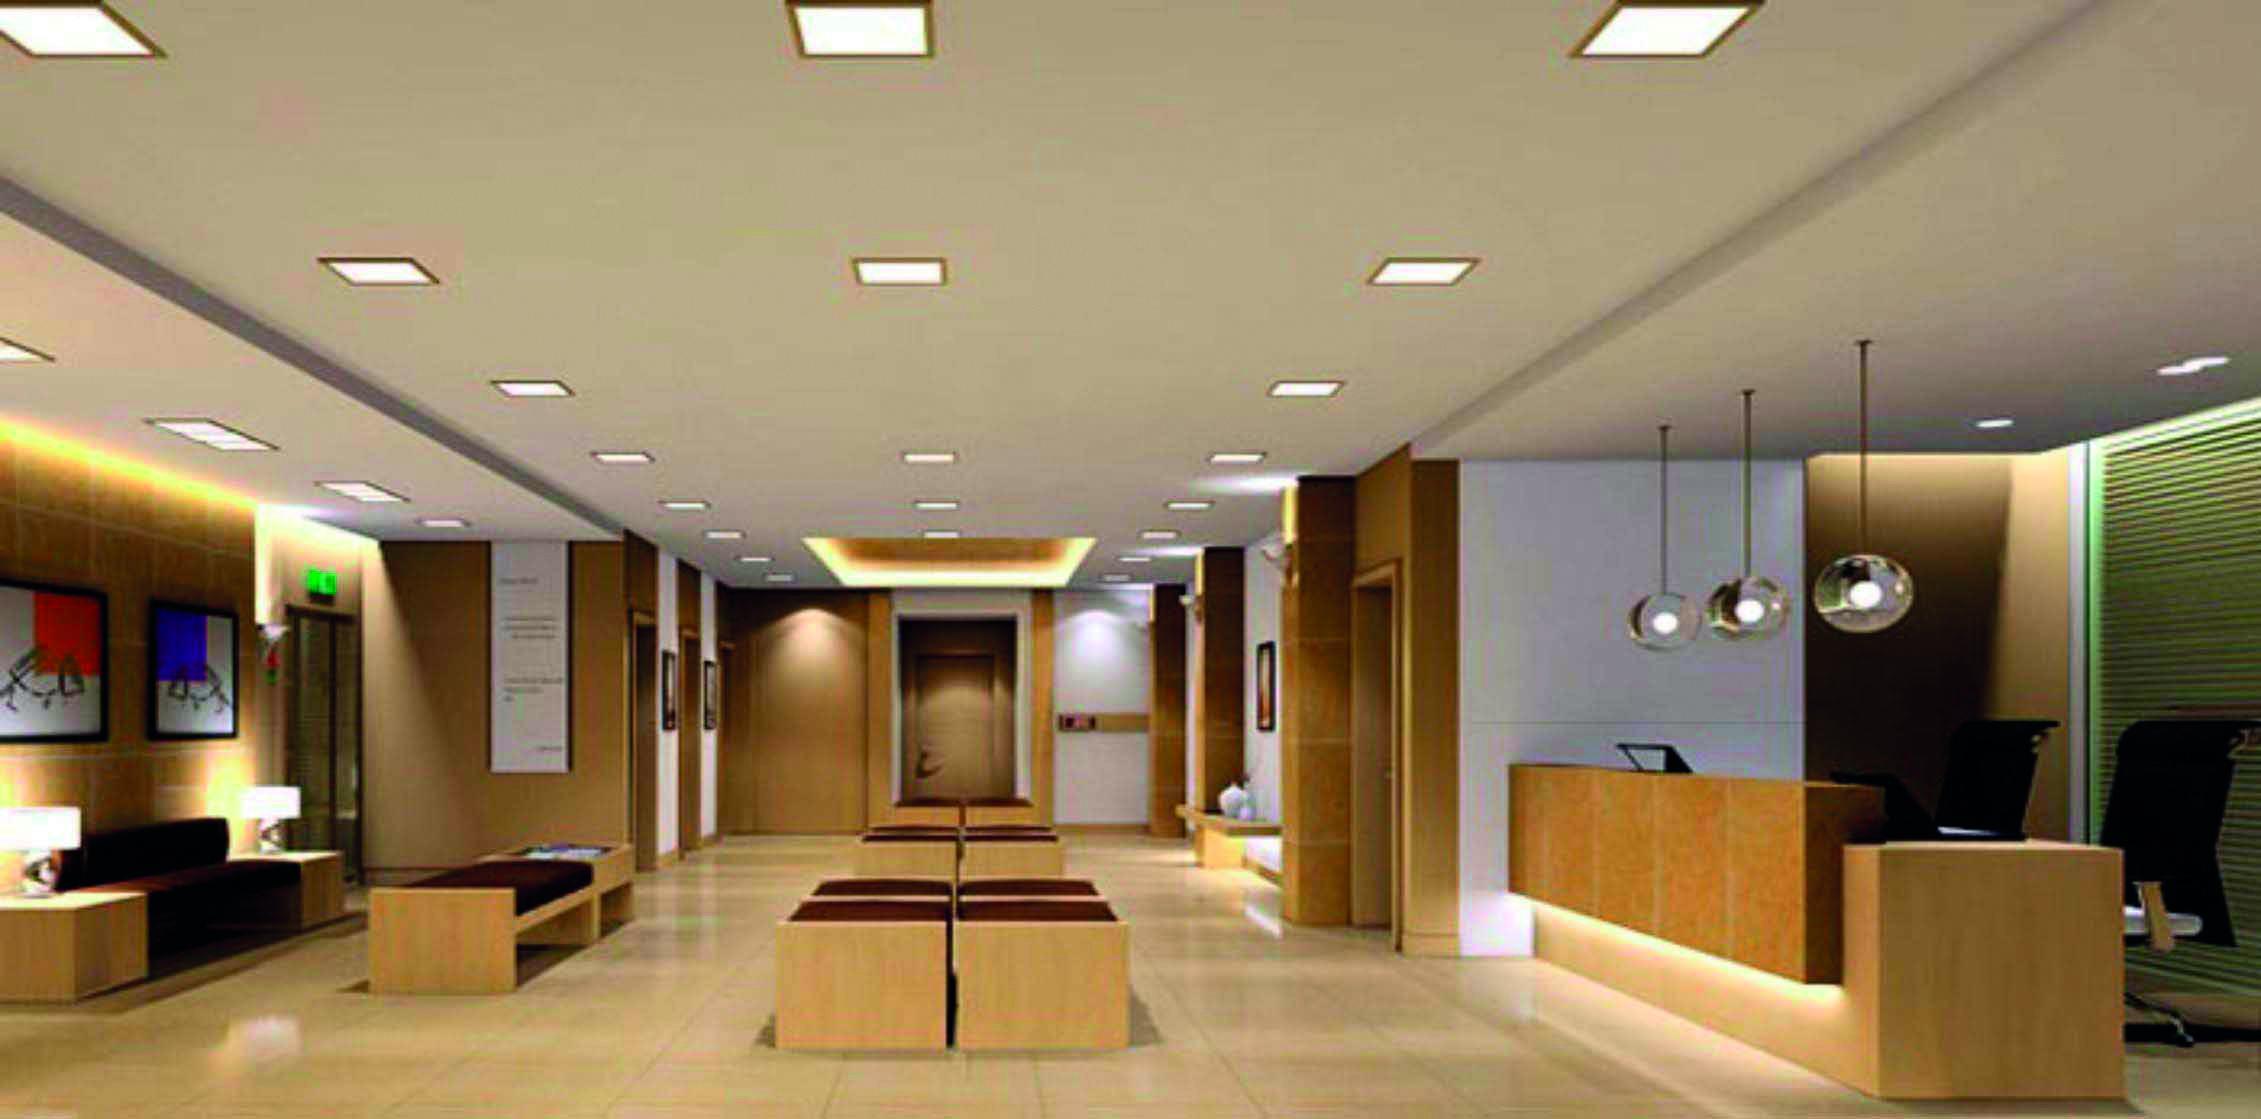 Panel Led Cuadrado Iluminaci 243 N Interior Venta Panel Led